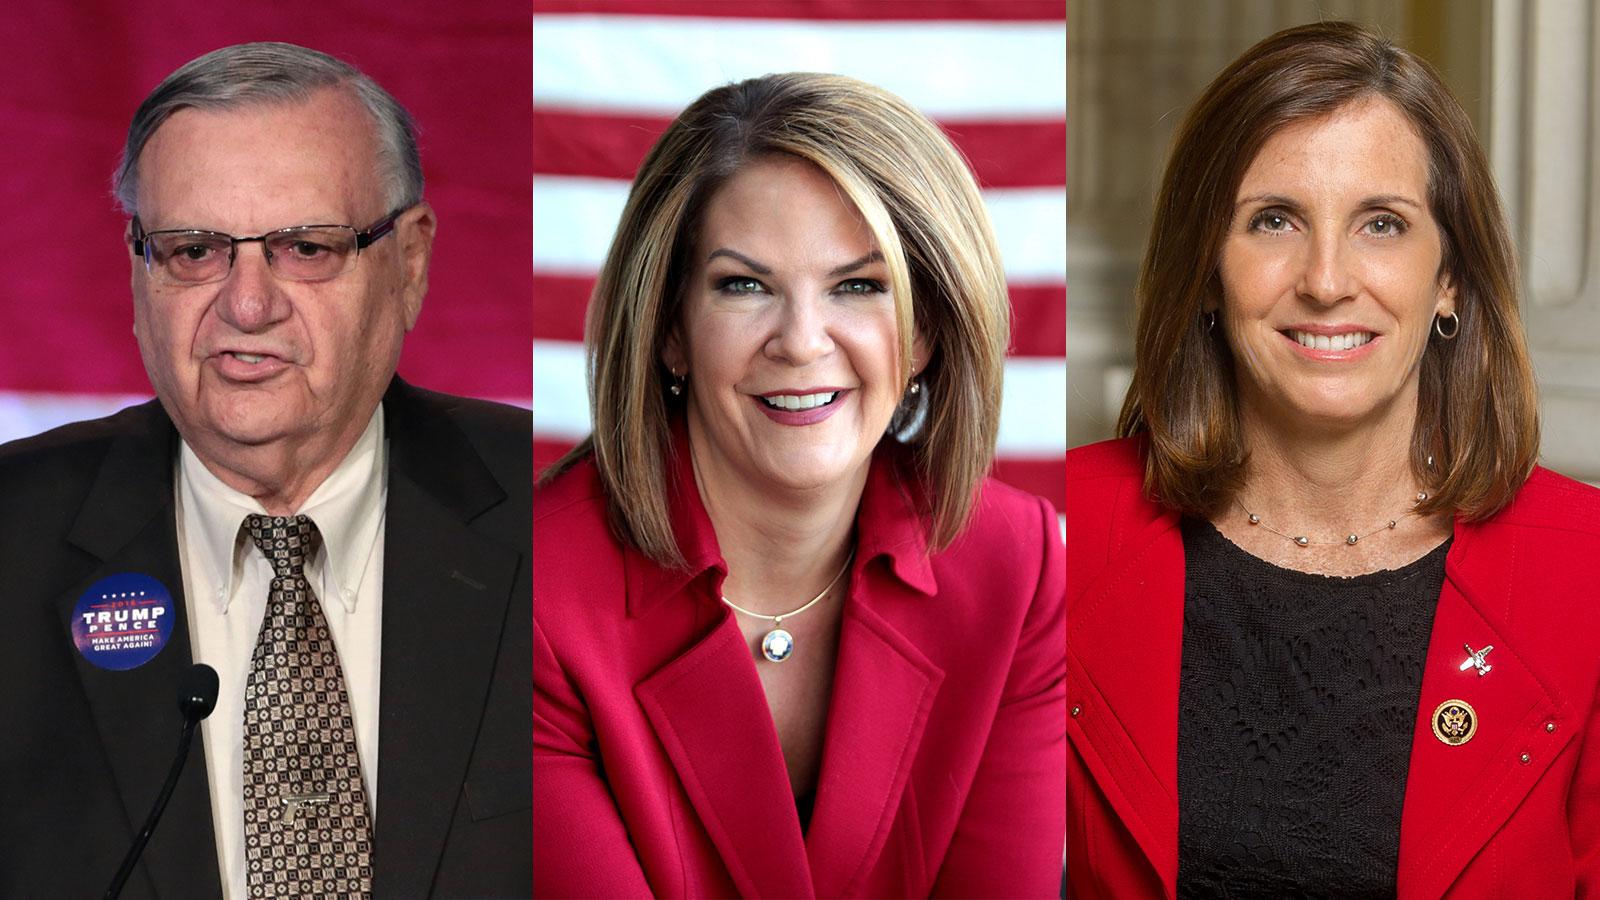 AZ Senate: Arpaio, Ward & McSally Share Dangerous Agenda, Unpopular Views on LGBTQ Issues